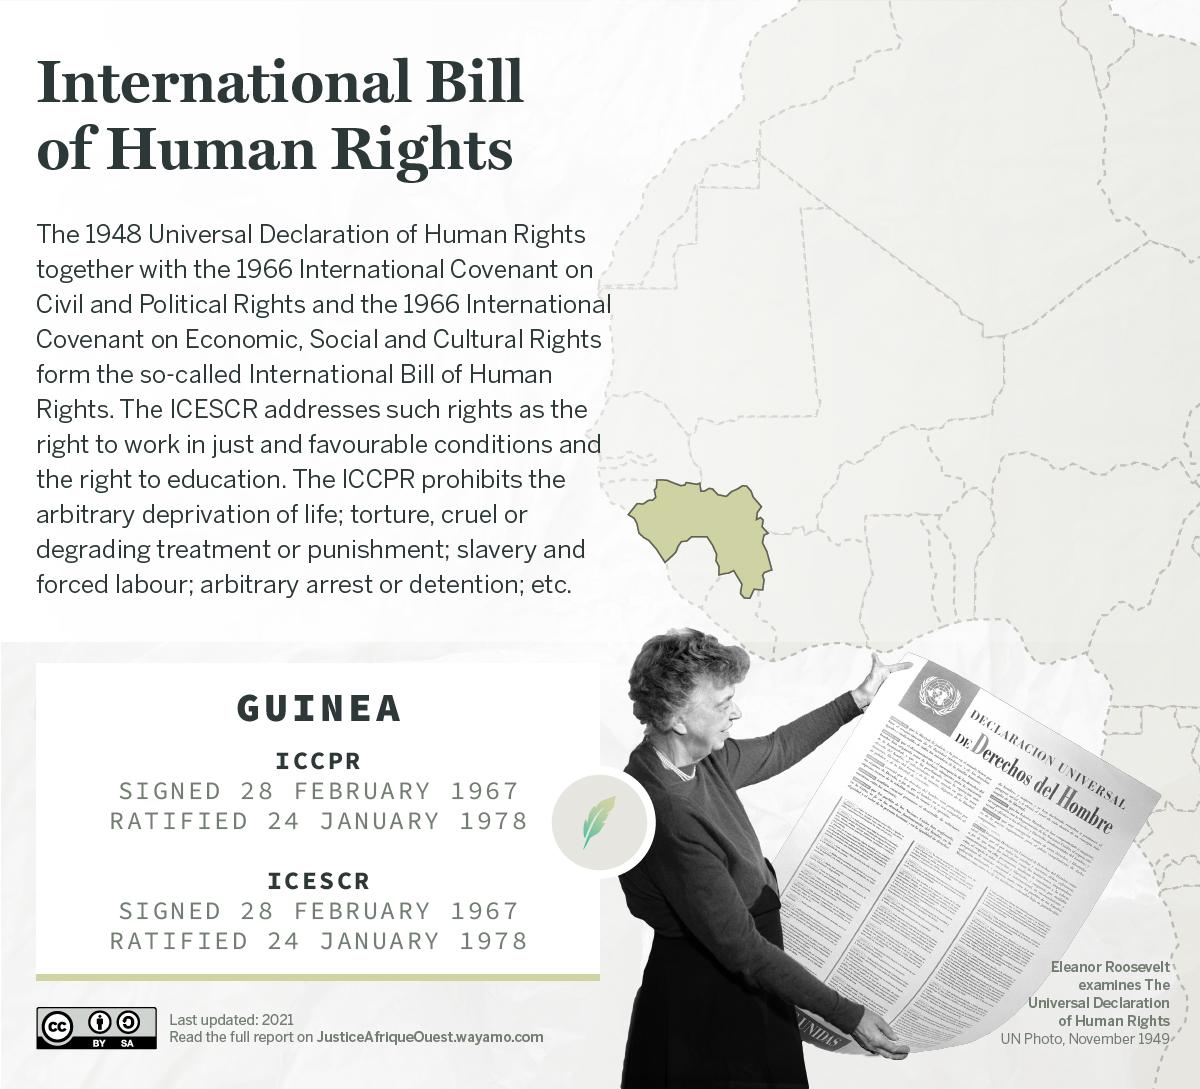 __GUINEA_International Bill of Human Rights - Wayamo Foundation (CC BY-SA 4.0)